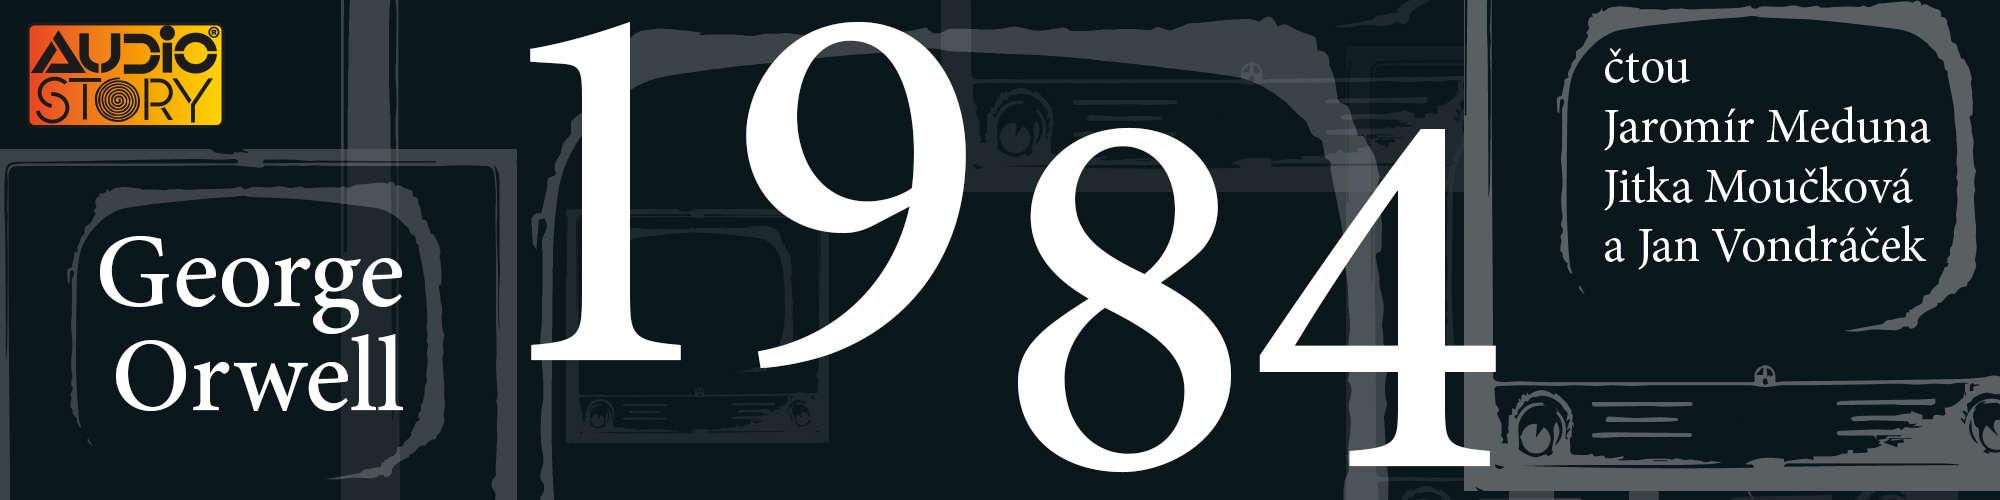 1984 Audiostory